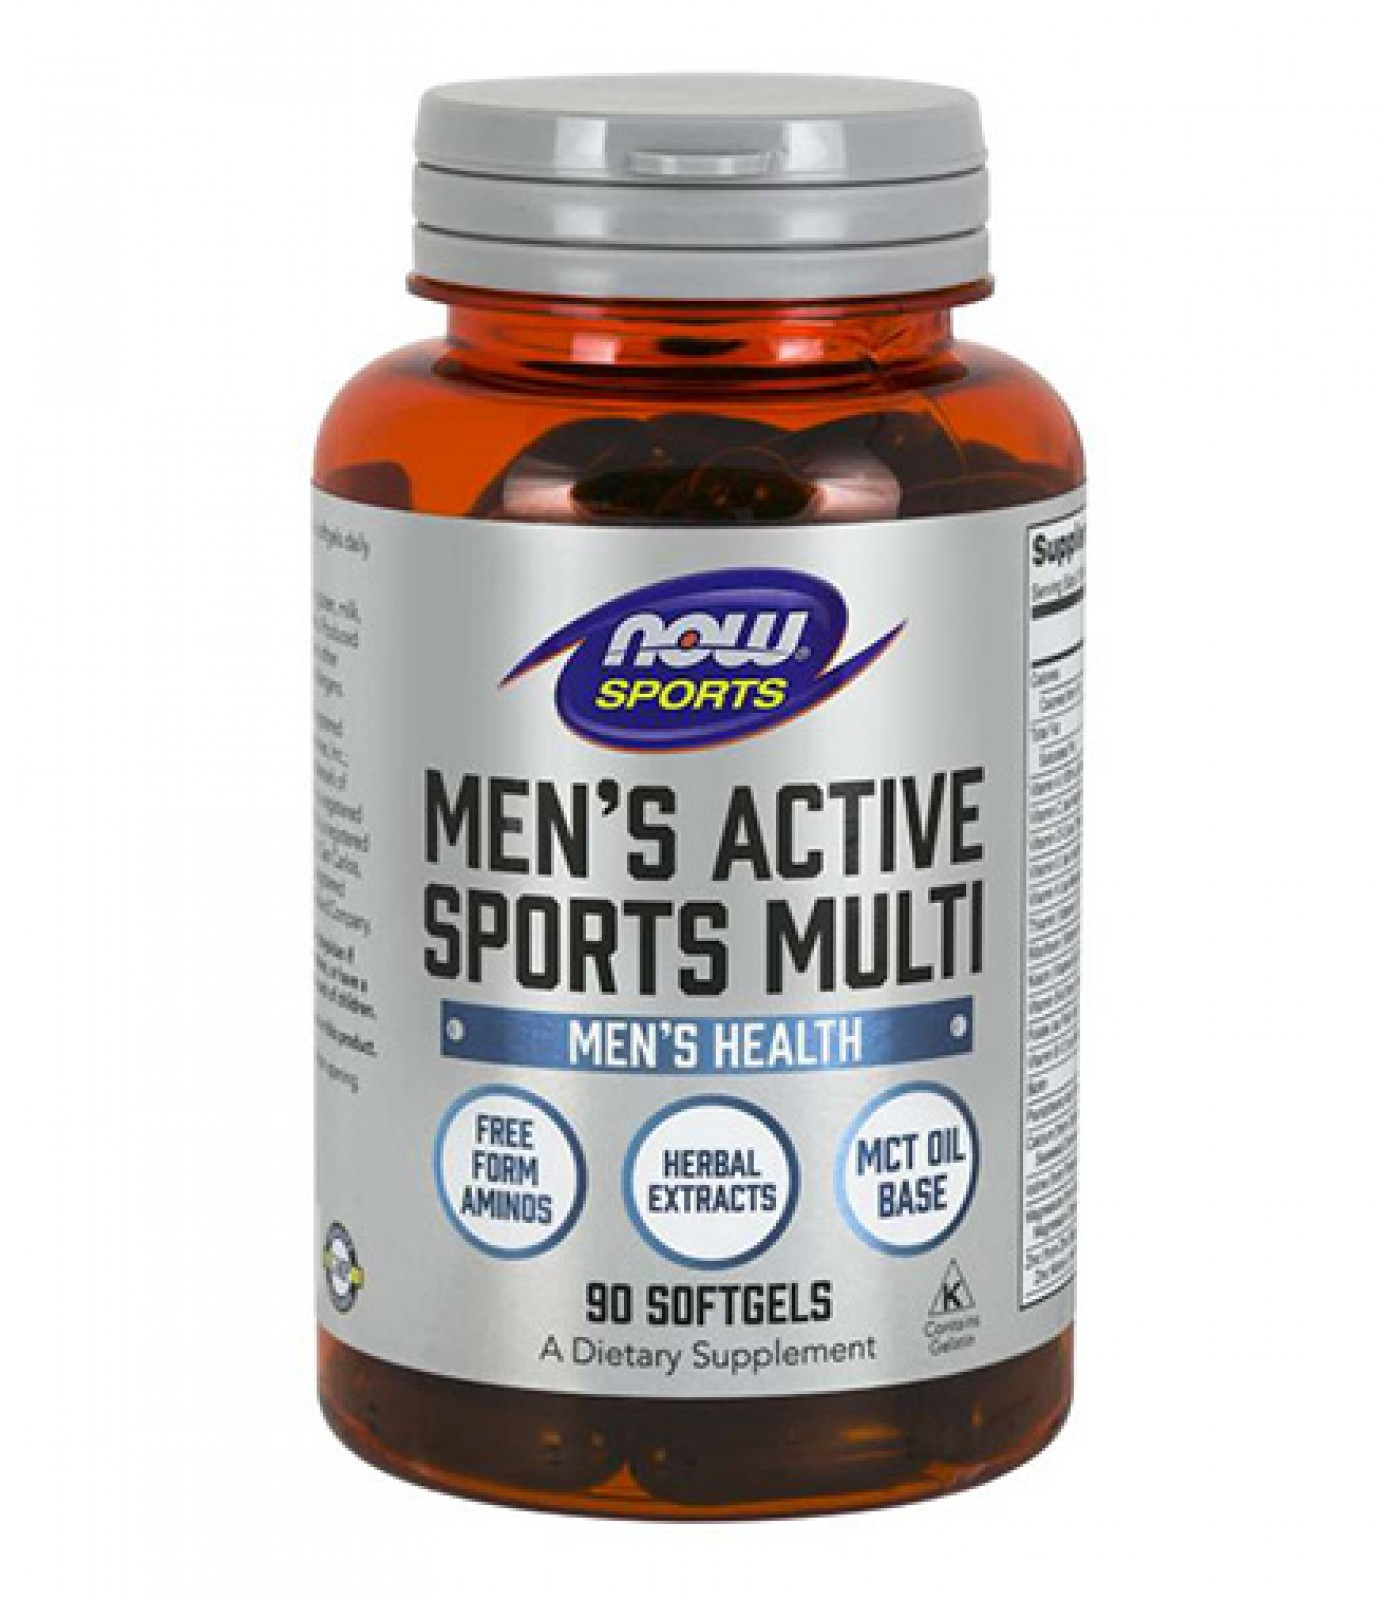 NOW - Men's Active Sports Multi / 90 softgels.